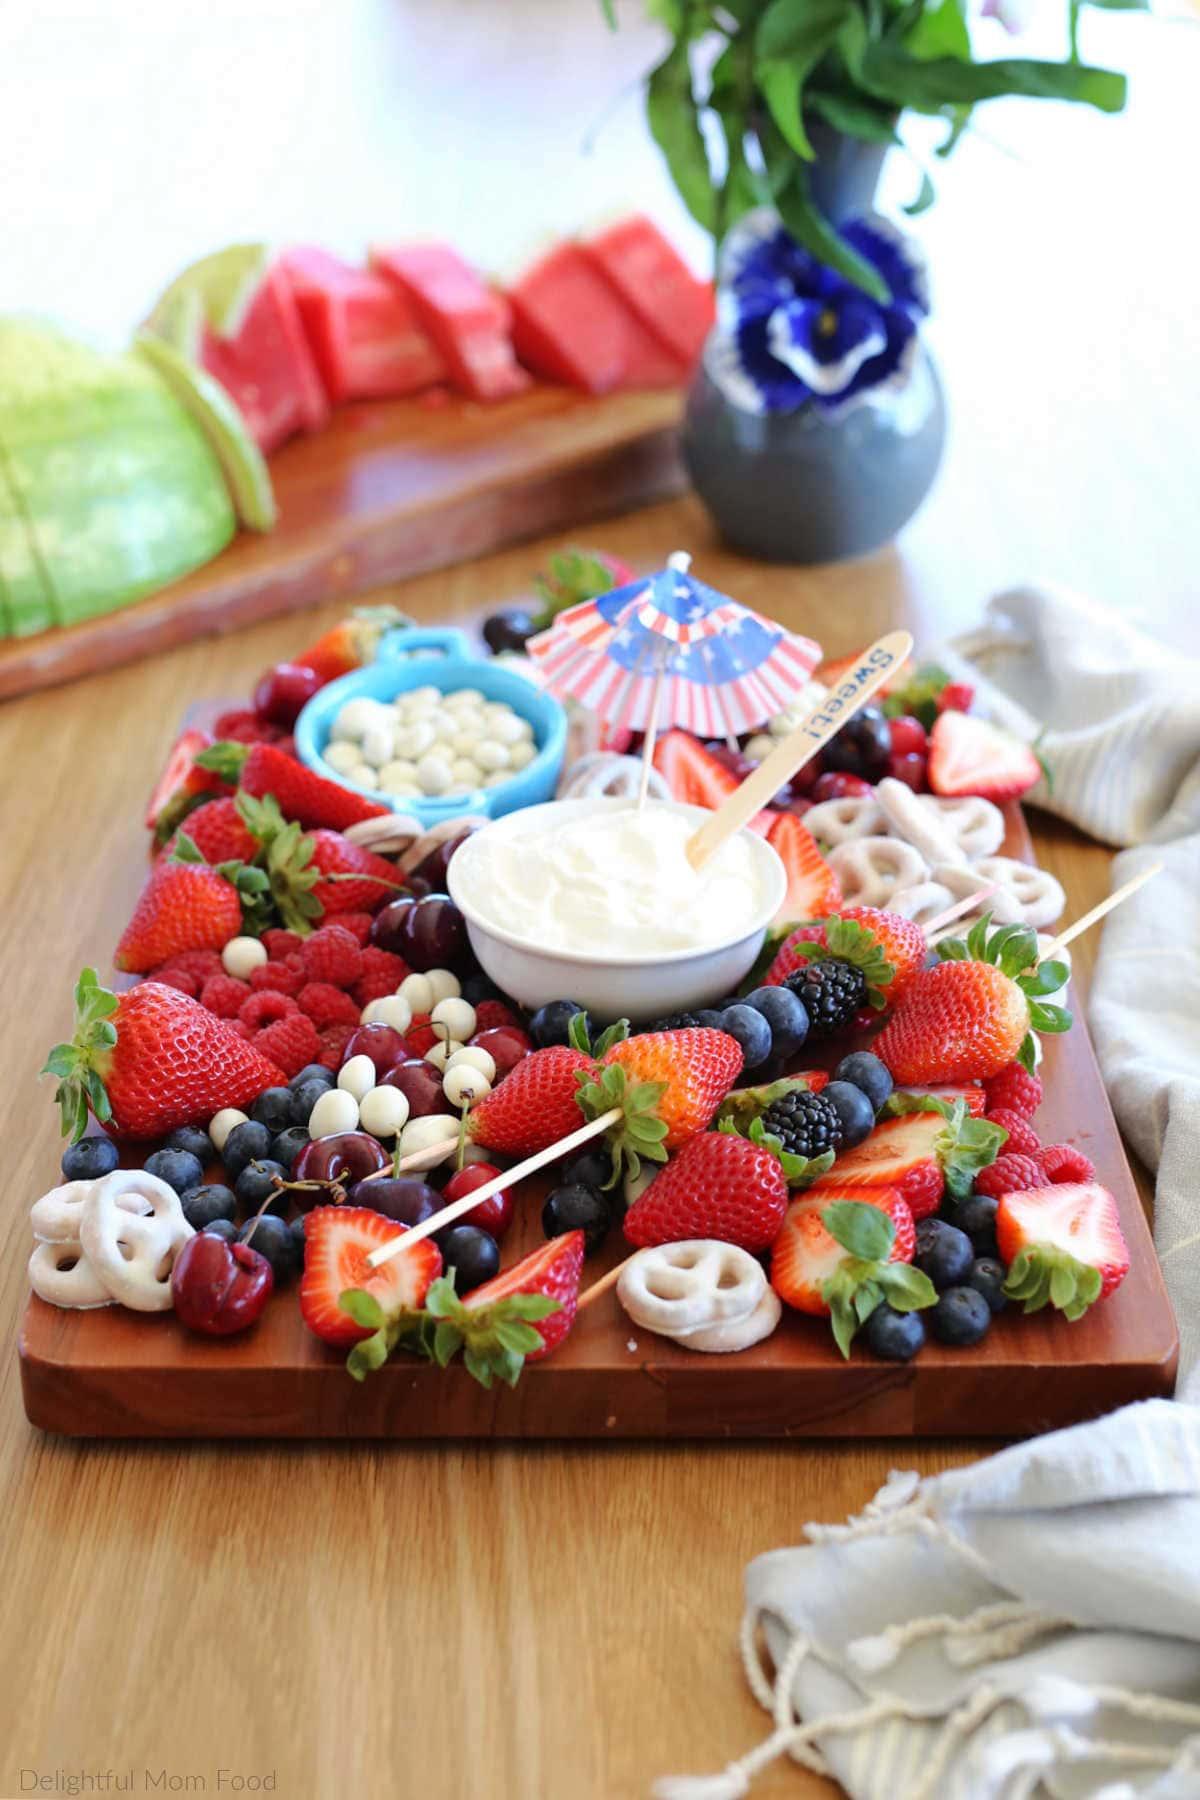 simple red white blue fruit platter with blueberries strawberries cherries yogurt covered pretzels and yogurt dip